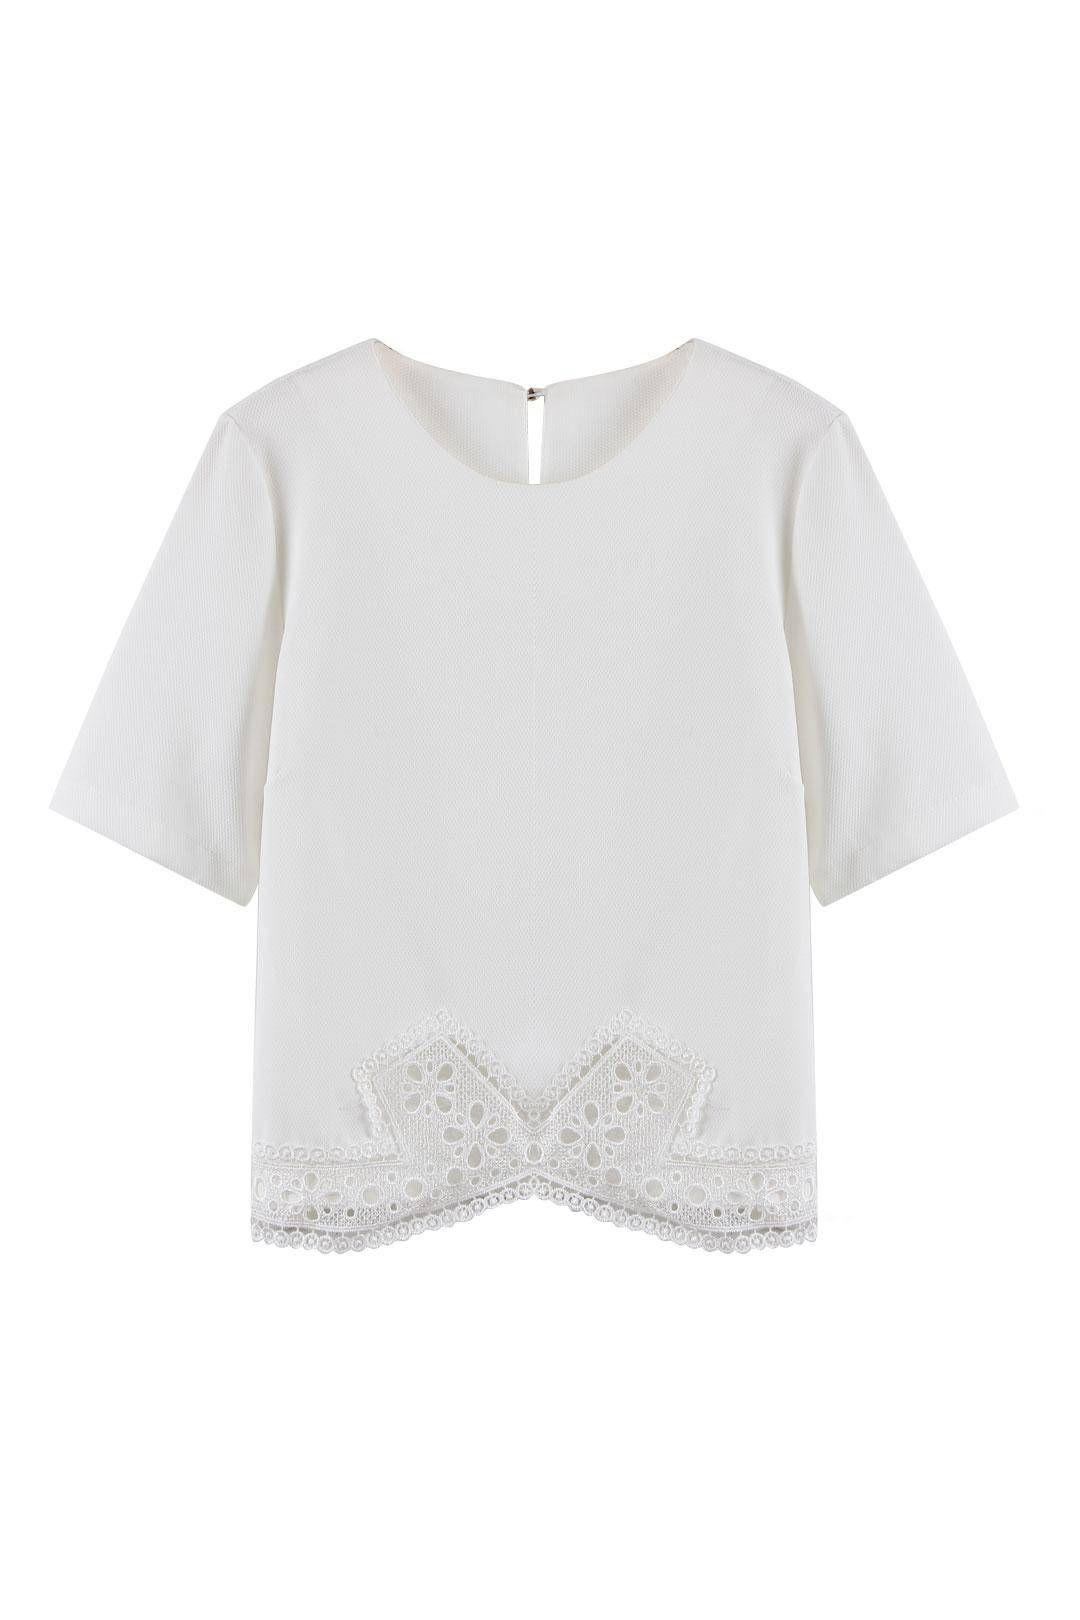 White Lace Hem Blouse - US$19.95 -YOINS